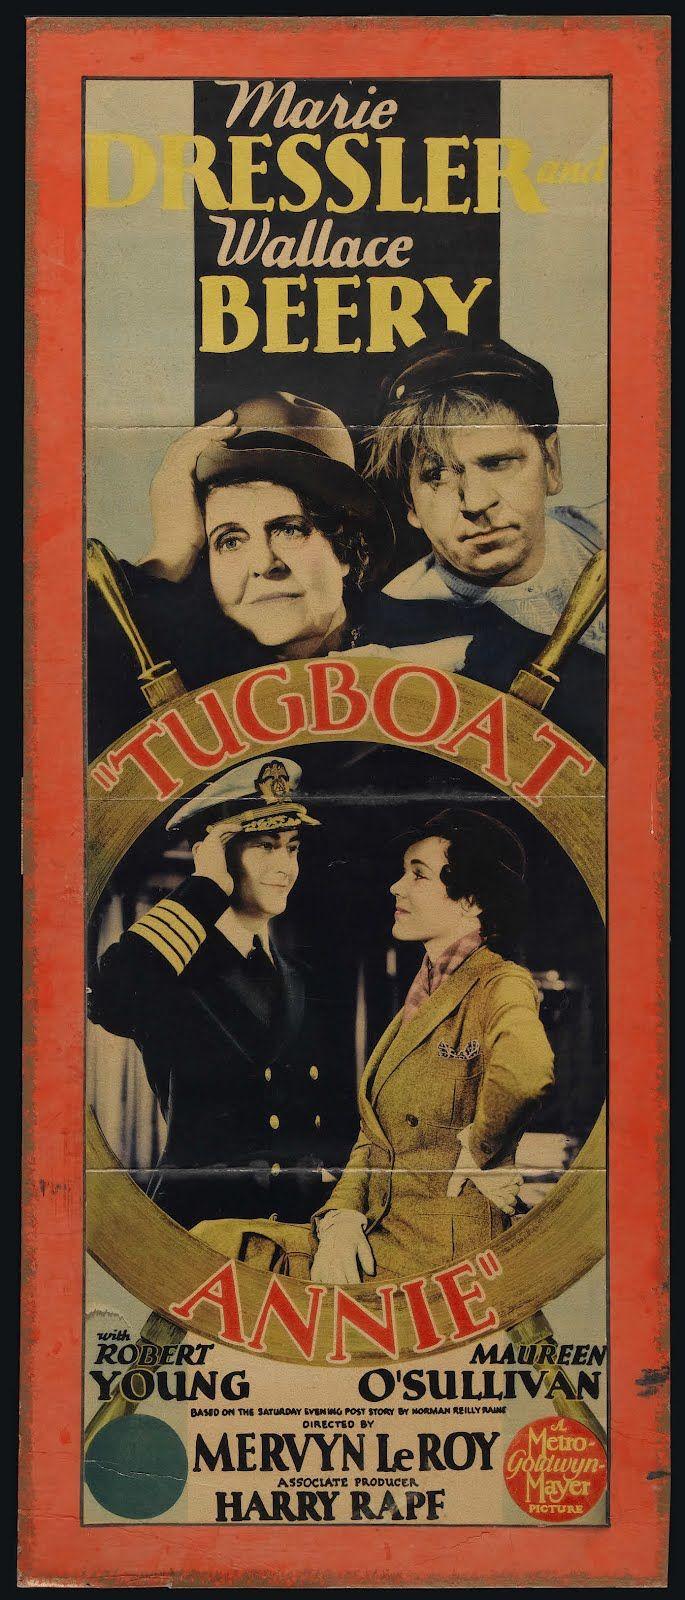 Rare film classics SILENT talkies TV on DVD: Marie Dressler ~ Dangerous Females (1929) & Tugboat Annie (1933)